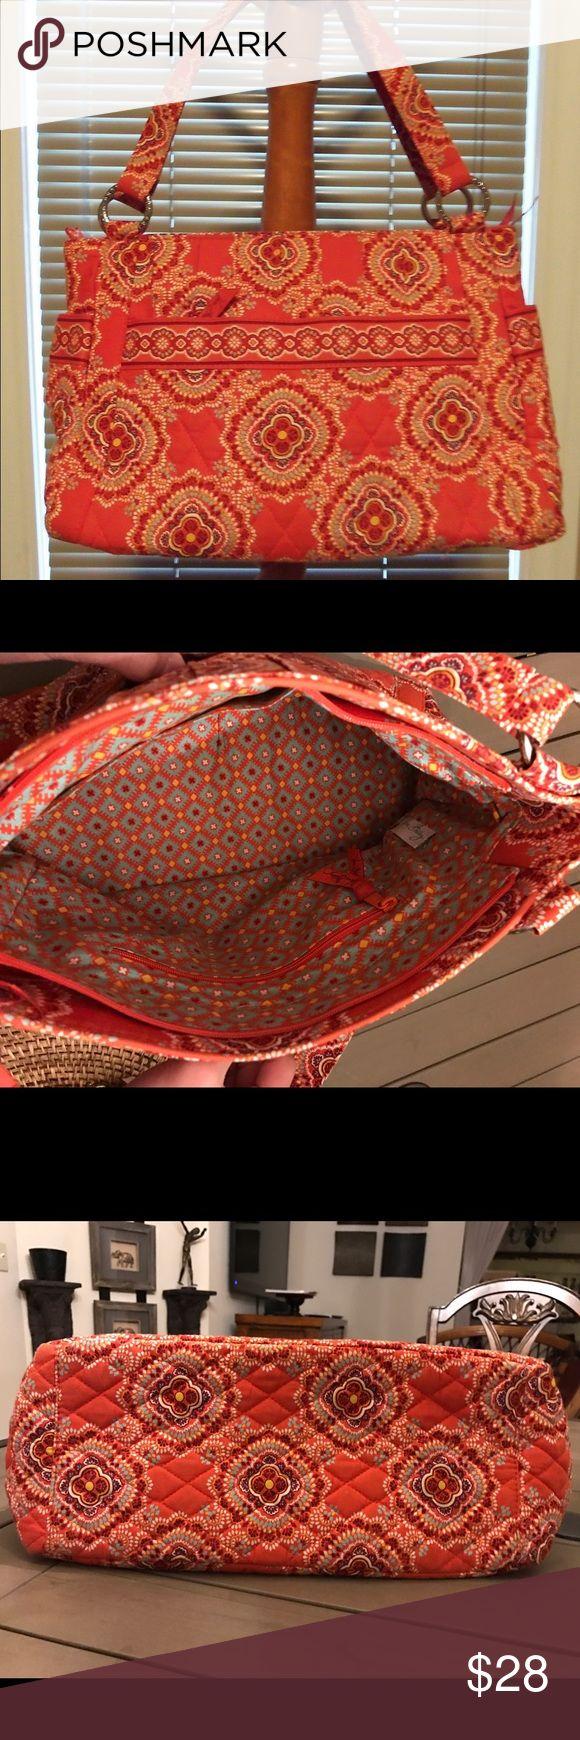 "Vera Bradley Stephanie ""Paprika"" Shoulder bag BRAND NEW with tag 👜. Vera Bradley (Retired) Paprika Orange shoulder bag. Zip top with cotton interior. Such a cute style. Vera Bradley Bags Shoulder Bags"